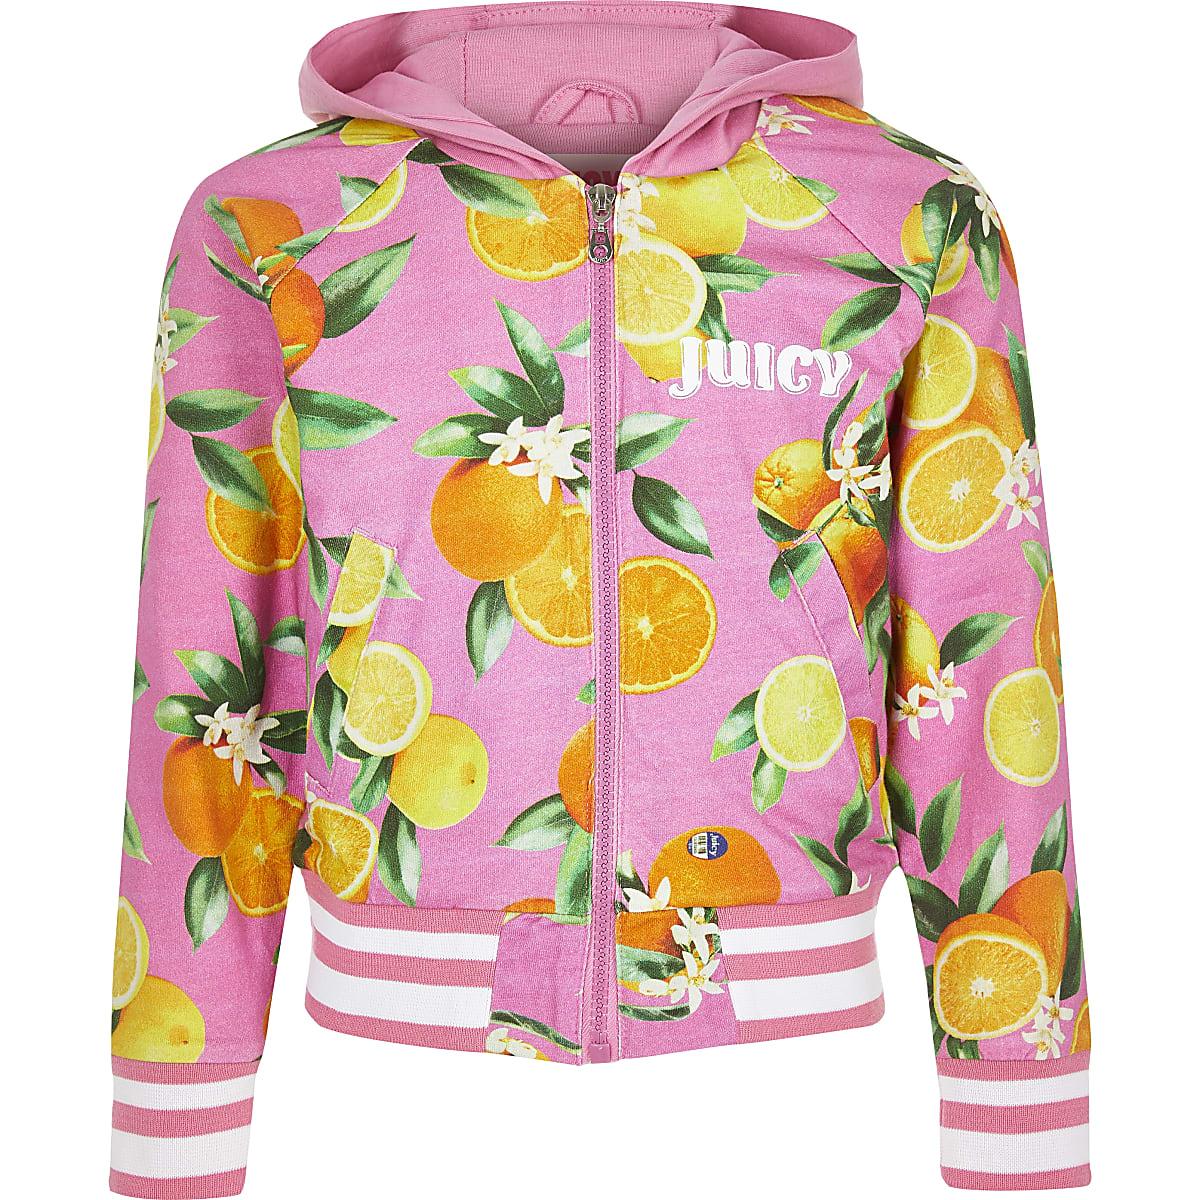 Girls pink 'juicy' fruit print jacket